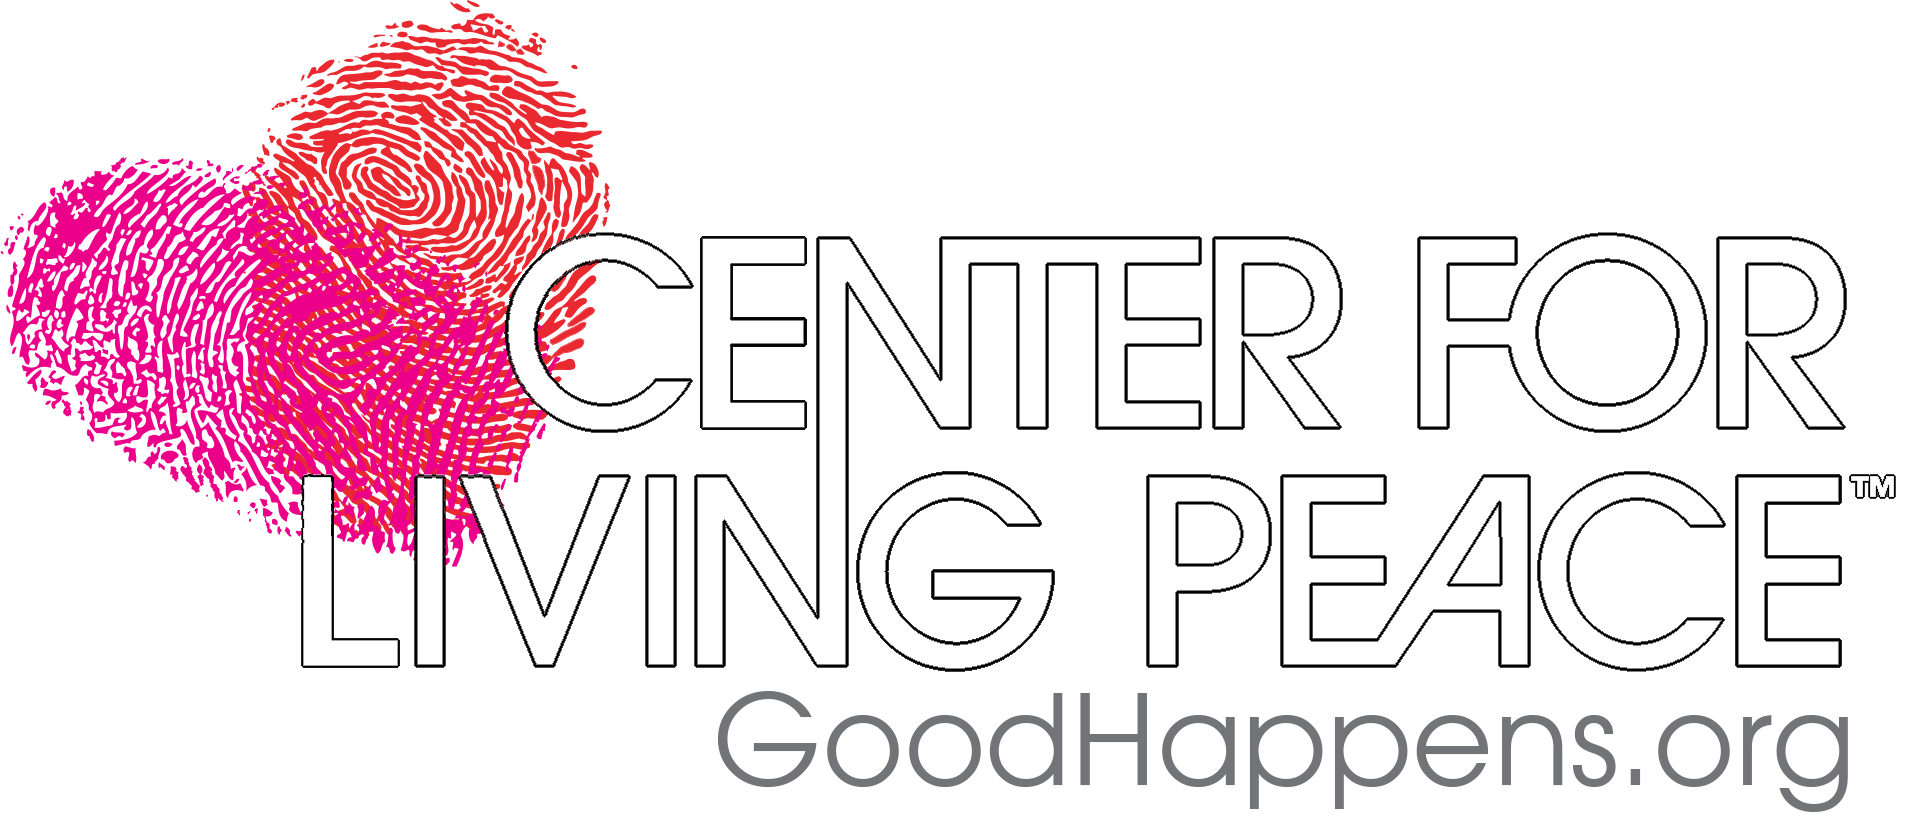 Center for Living Peace